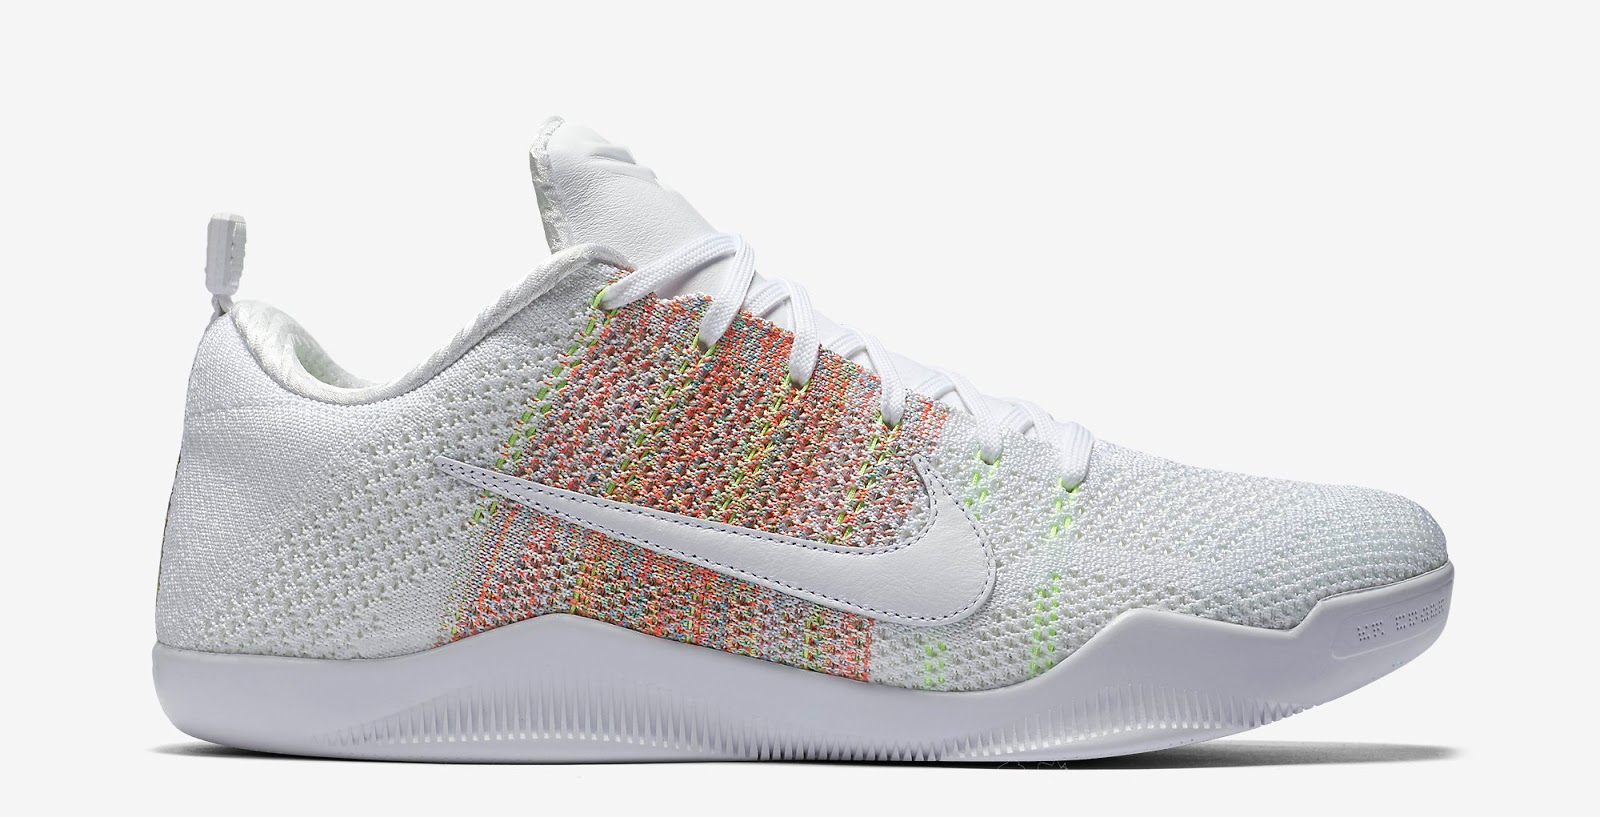 2015 New Nike kobe 8 2013 Kobe Byrant Cheap sale Green Black 555